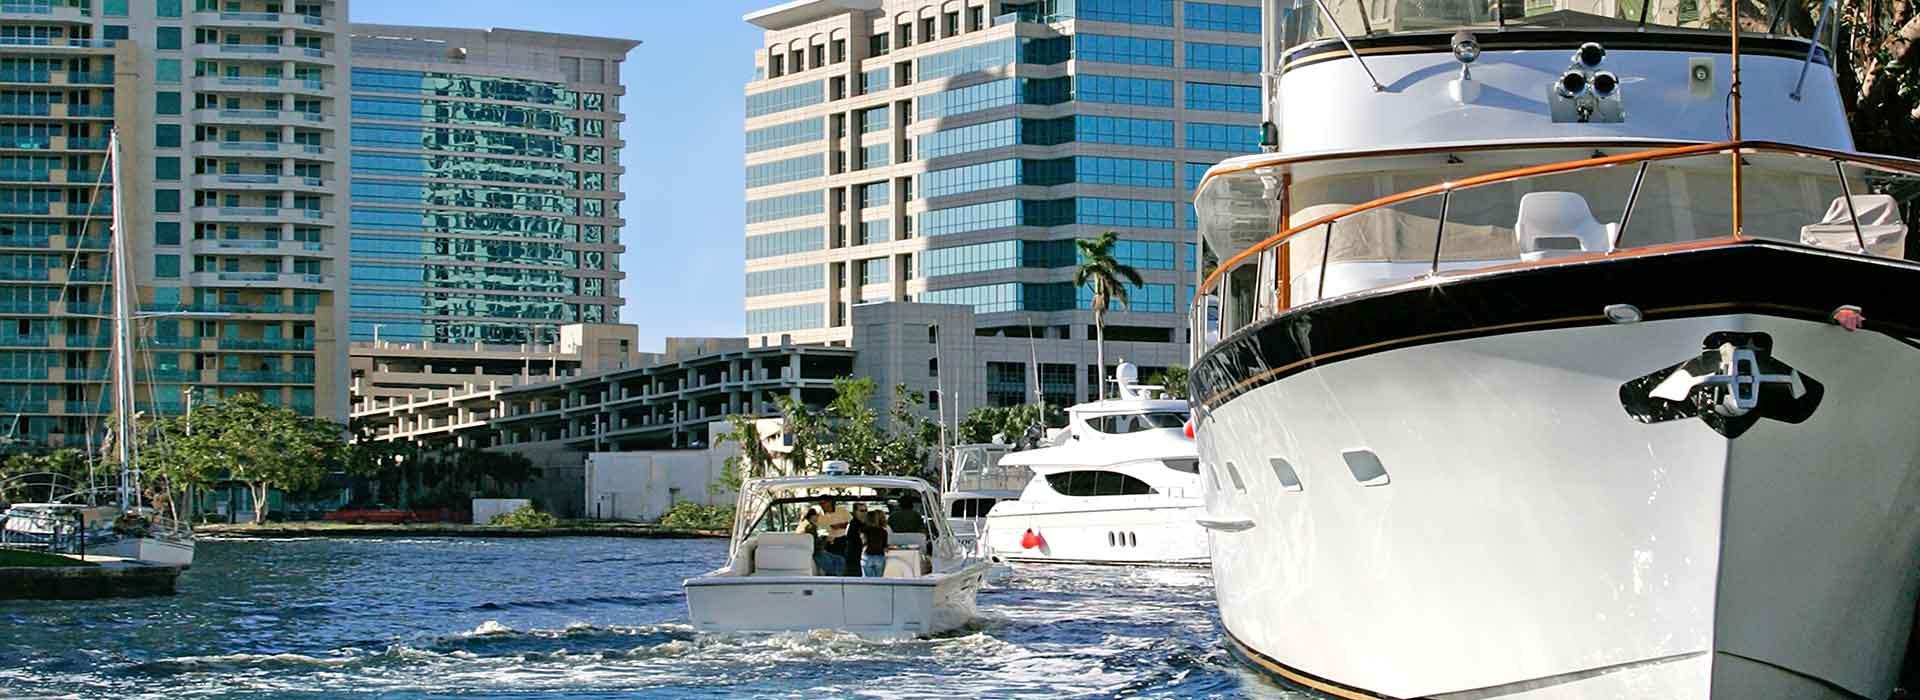 Fort Lauderdale International Boat Show and Marine International Hub